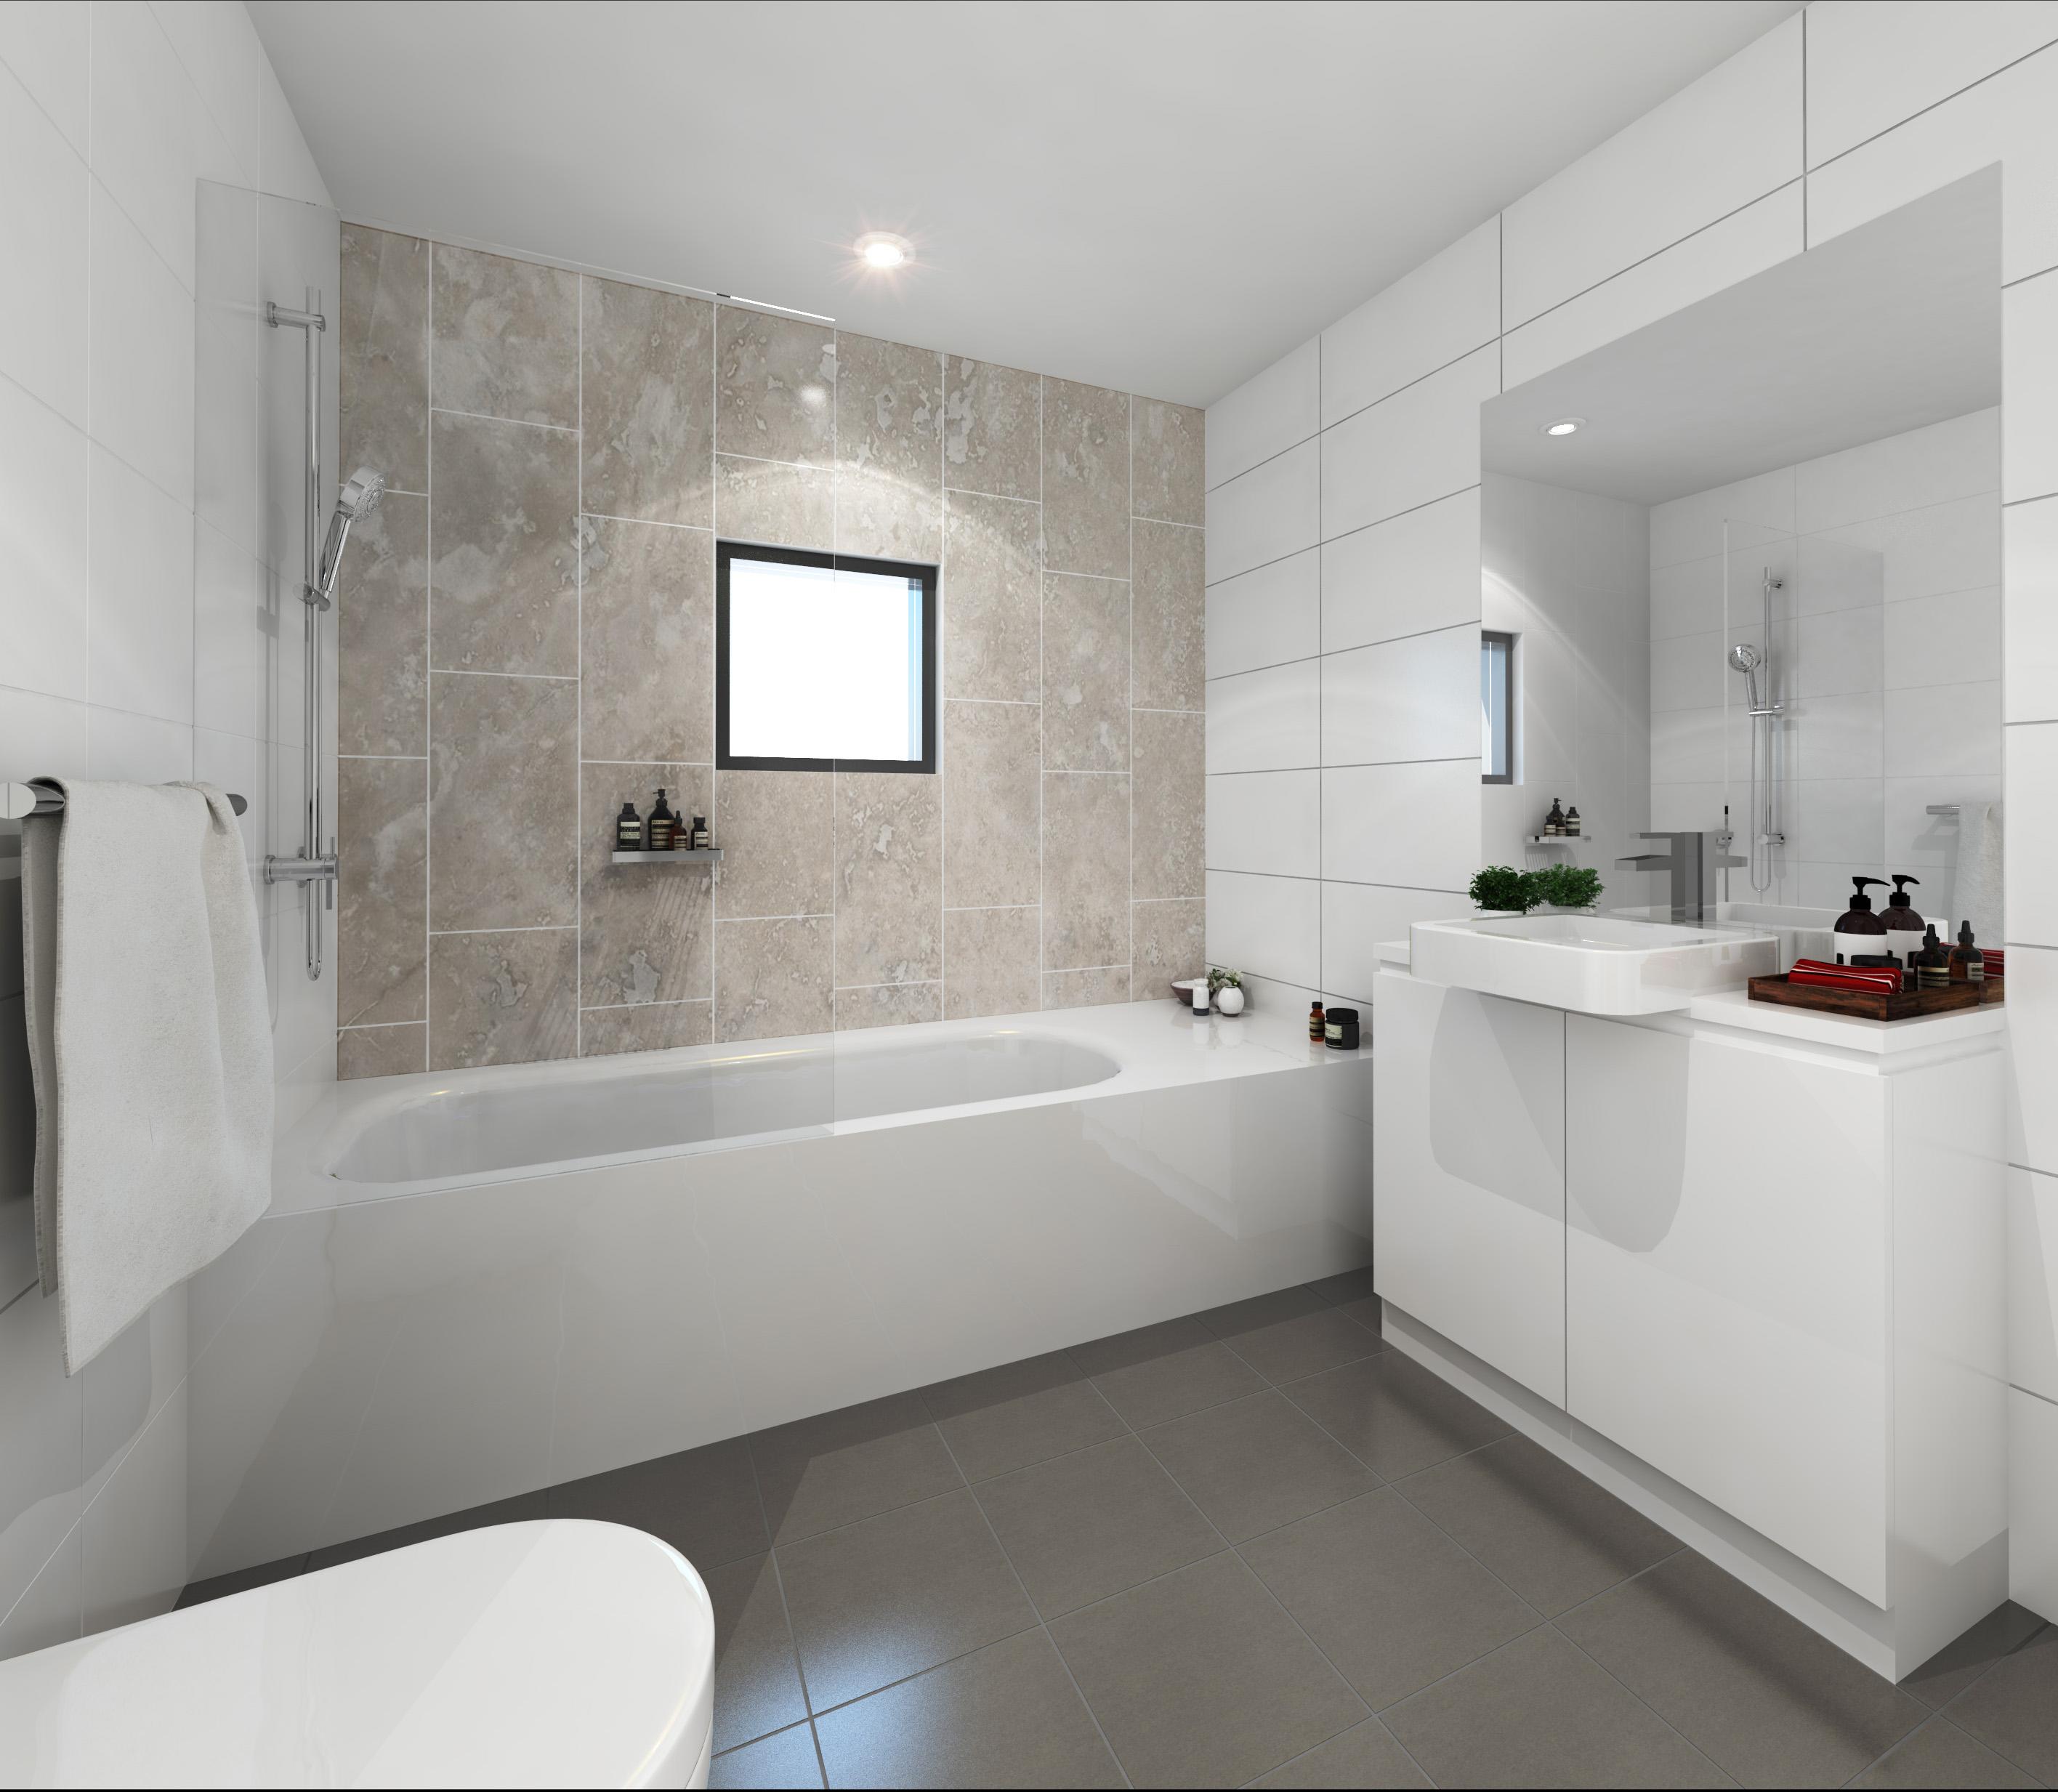 141016 Botany CGI - Bathroom